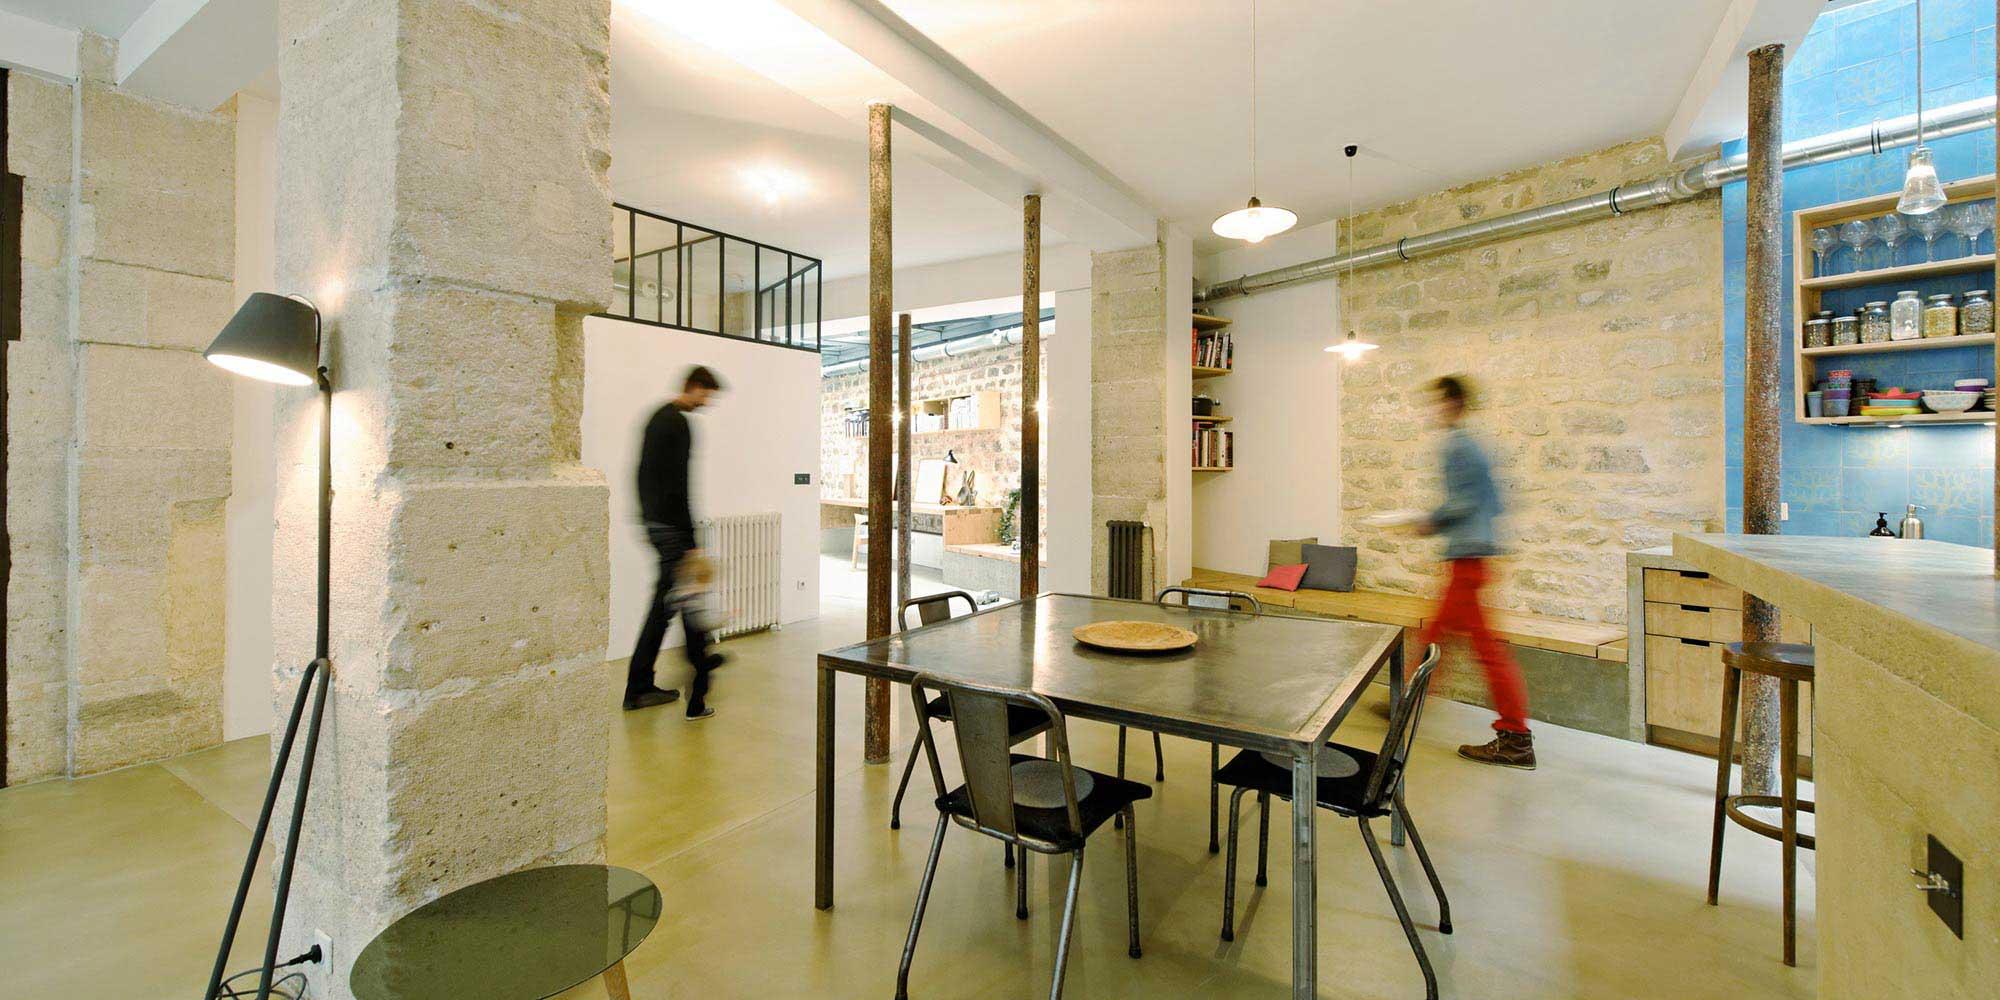 les journ es d 39 architectures vivre 2016. Black Bedroom Furniture Sets. Home Design Ideas